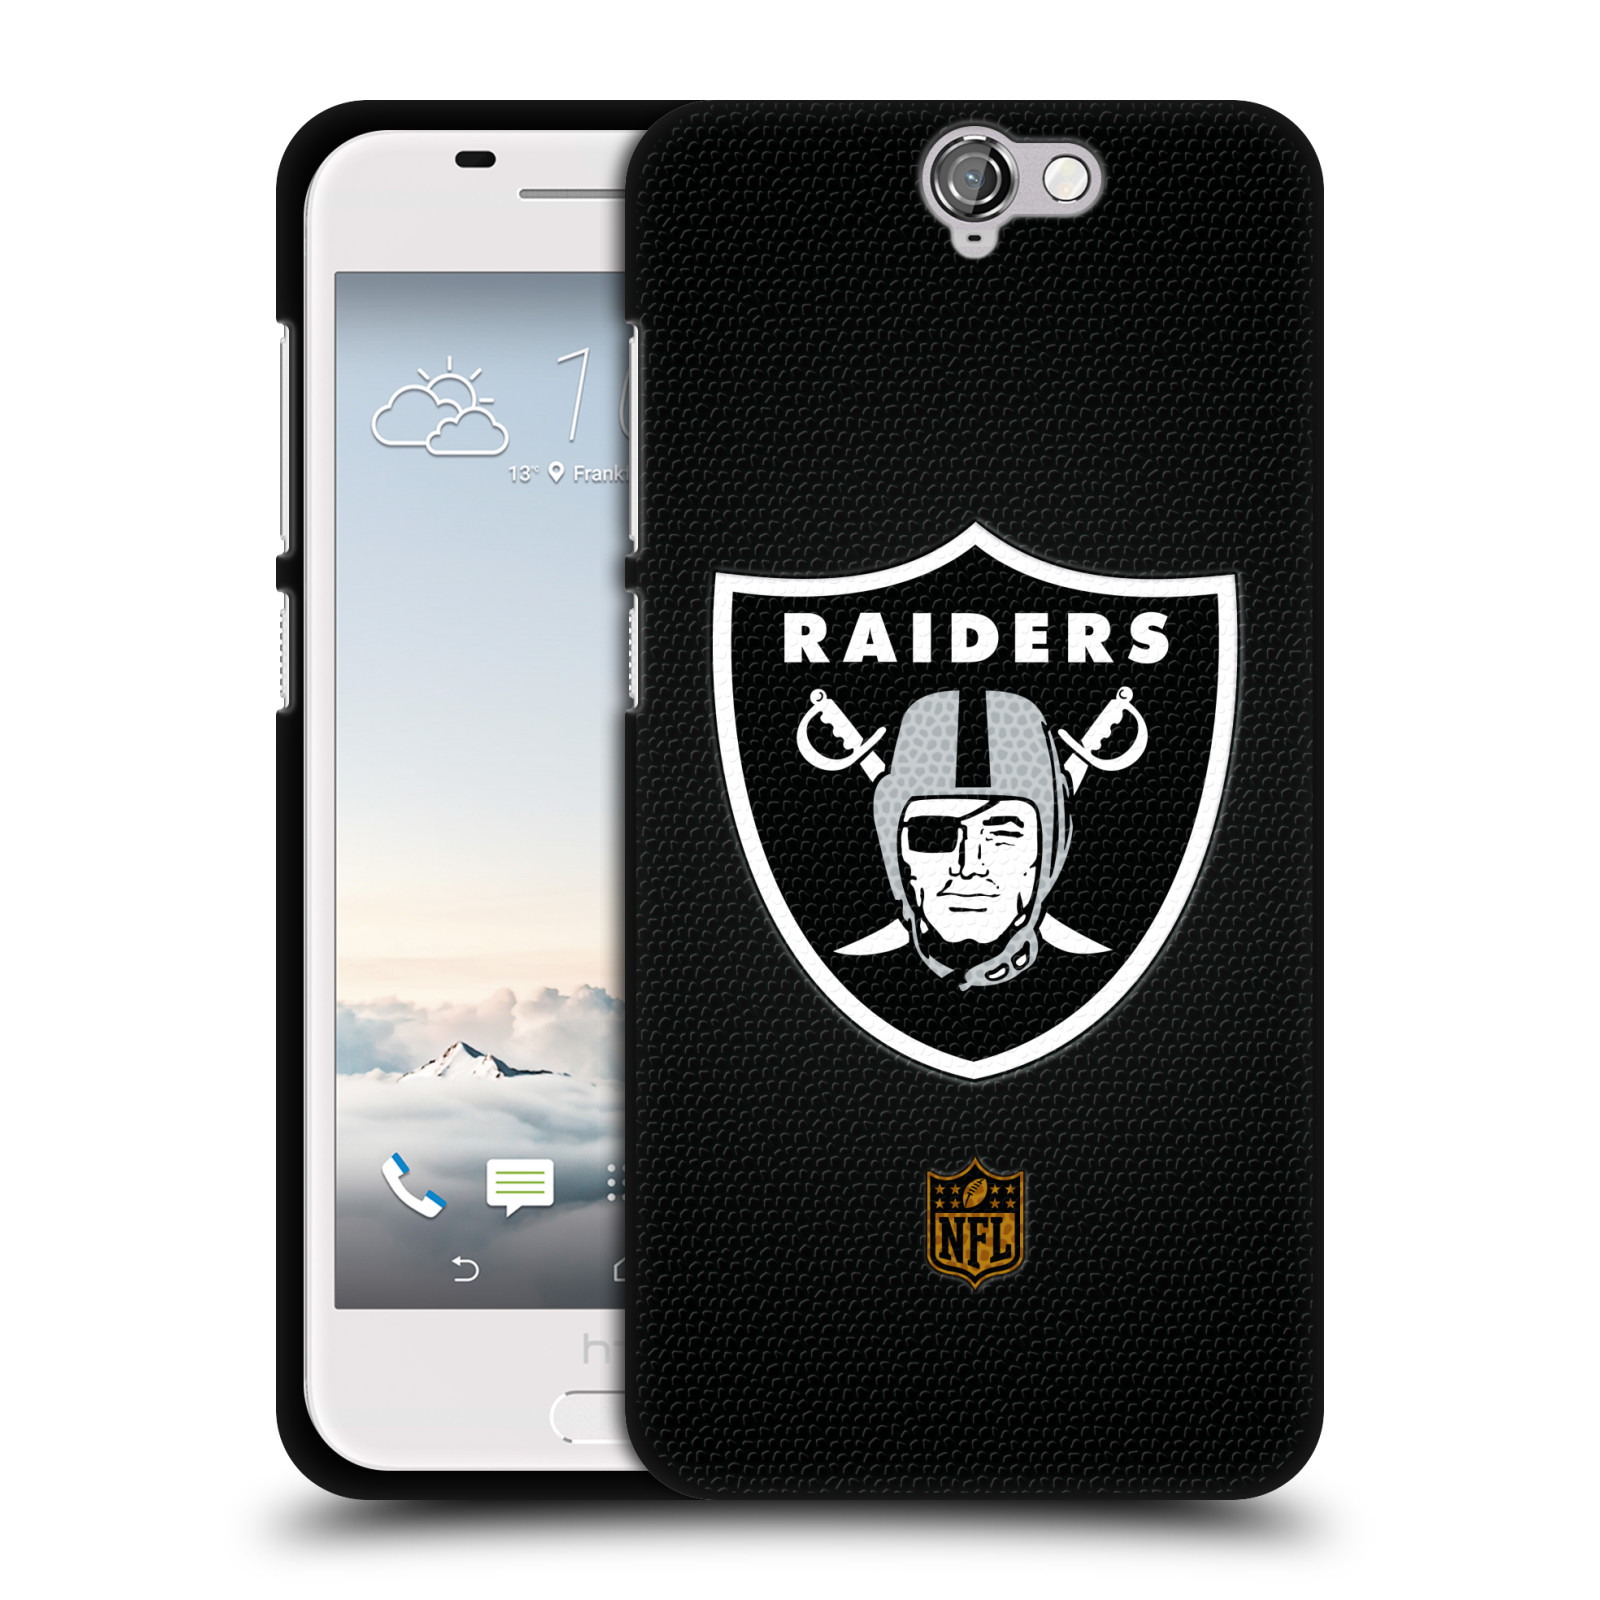 OFFICIAL-NFL-OAKLAND-RAIDERS-LOGO-BLACK-SOFT-GEL-CASE-FOR-HTC-PHONES